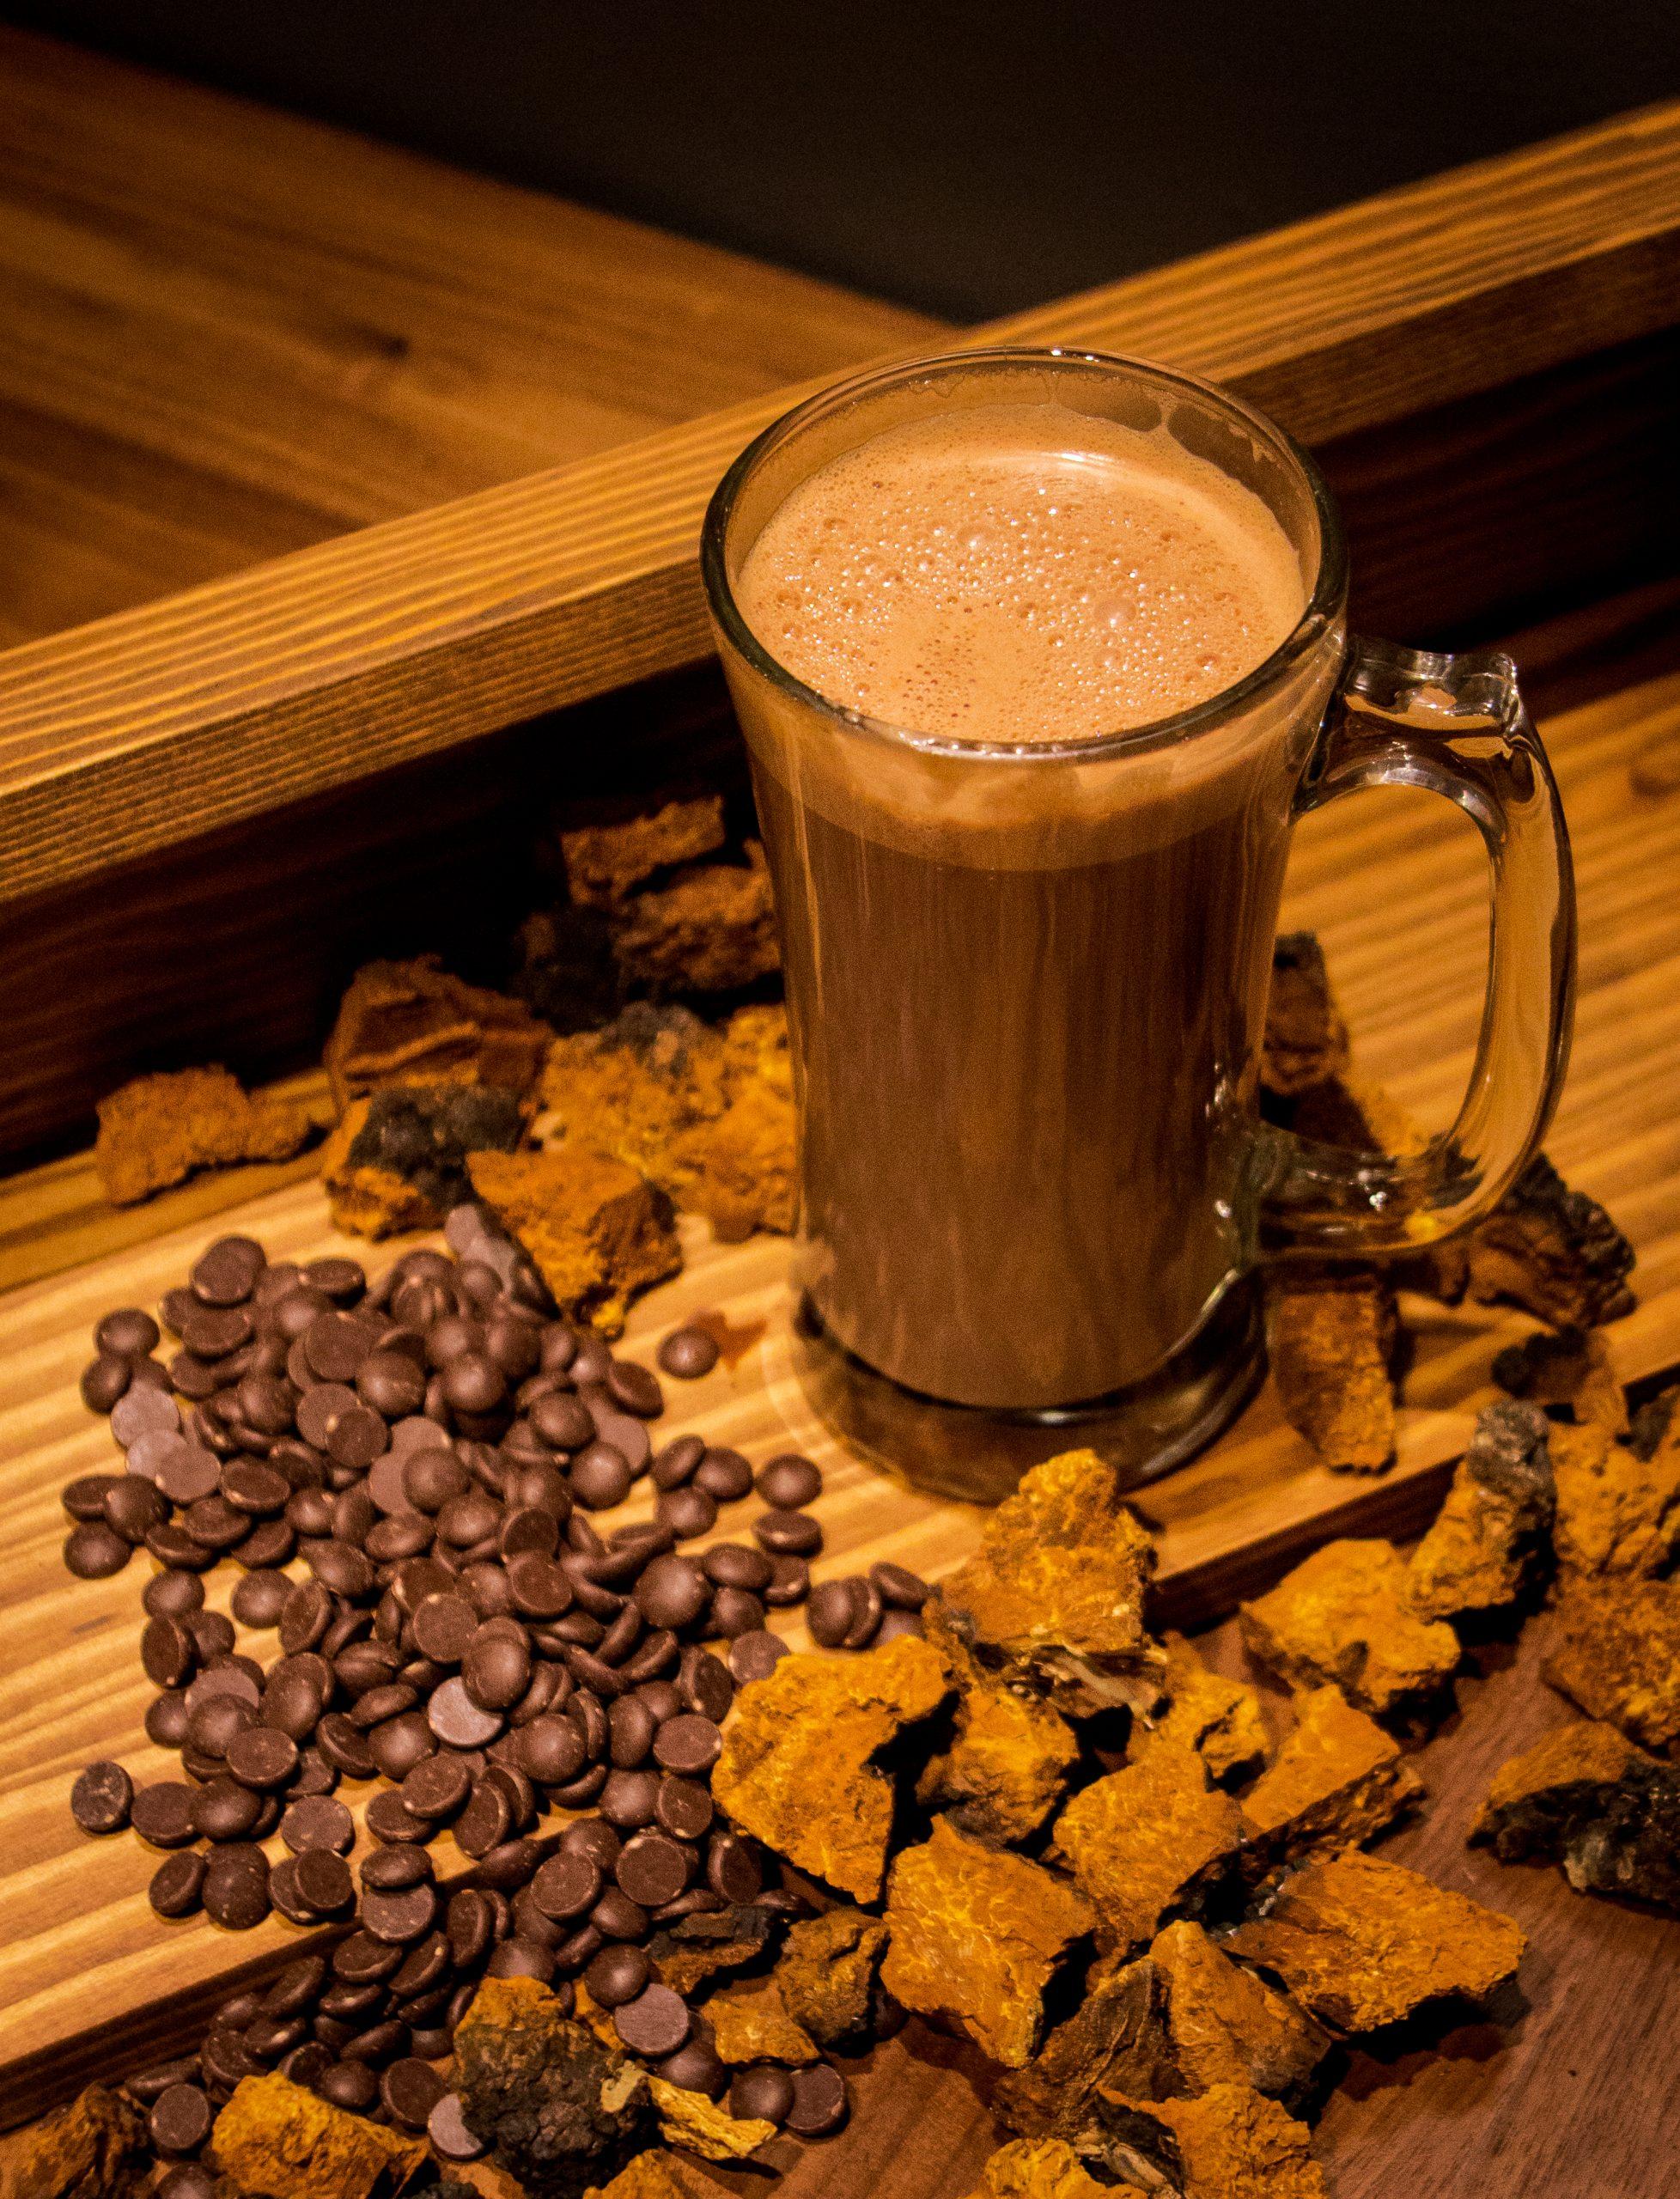 https://gisement.ca/wp-content/uploads/2016/10/chocolat-chaud-chaga-scaled.jpg